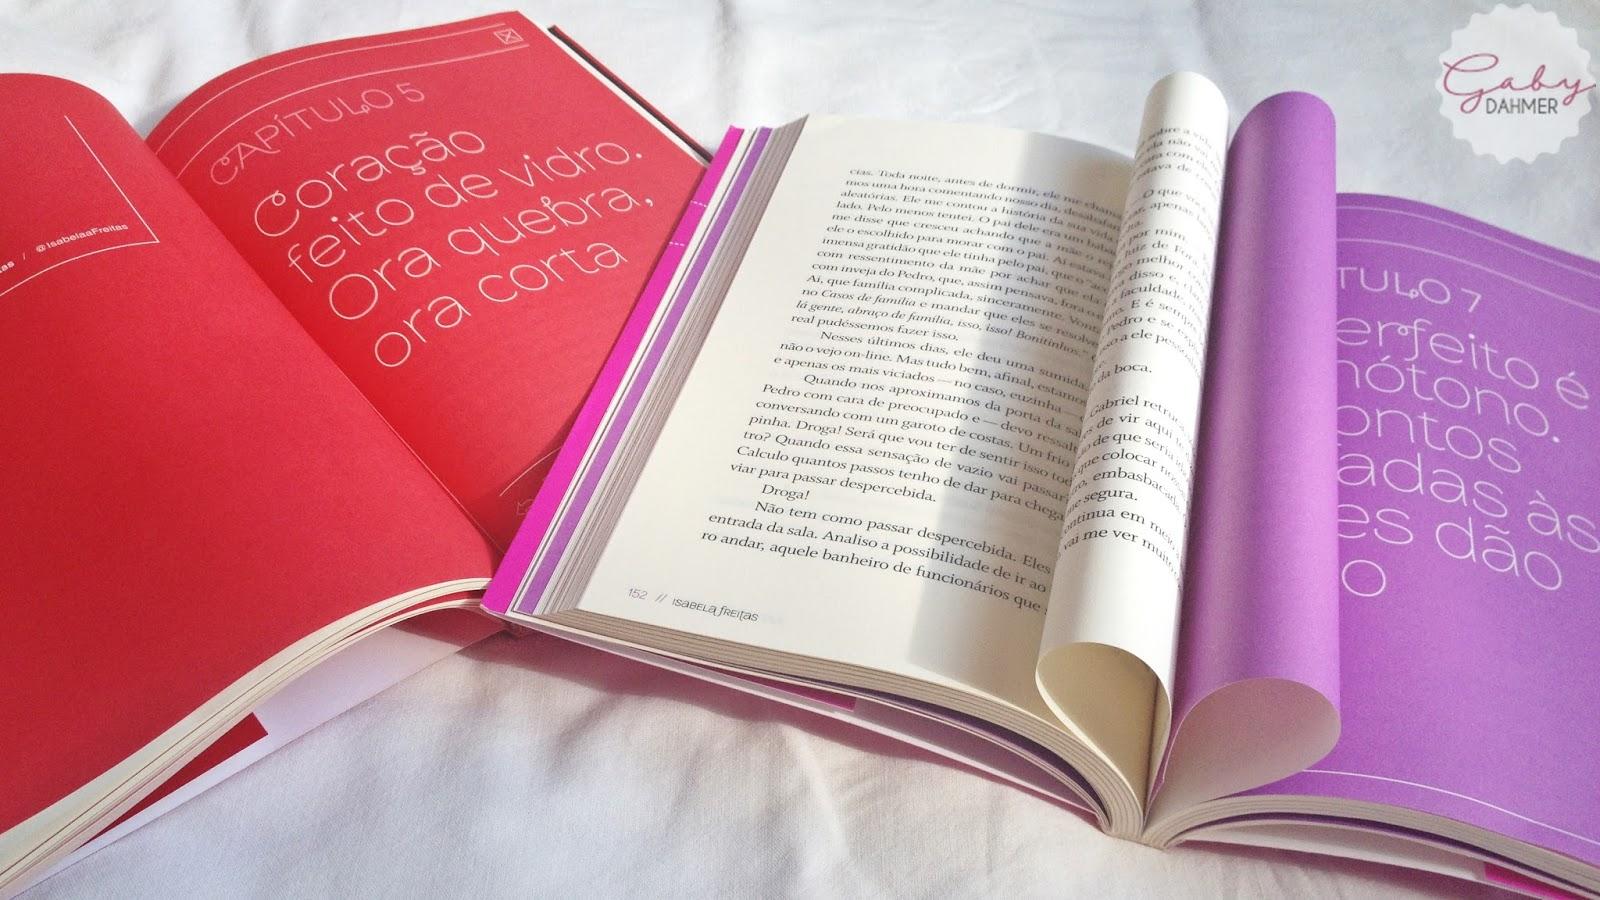 Tag Frases Do Livro Nao Se Iluda Nao Tumblr